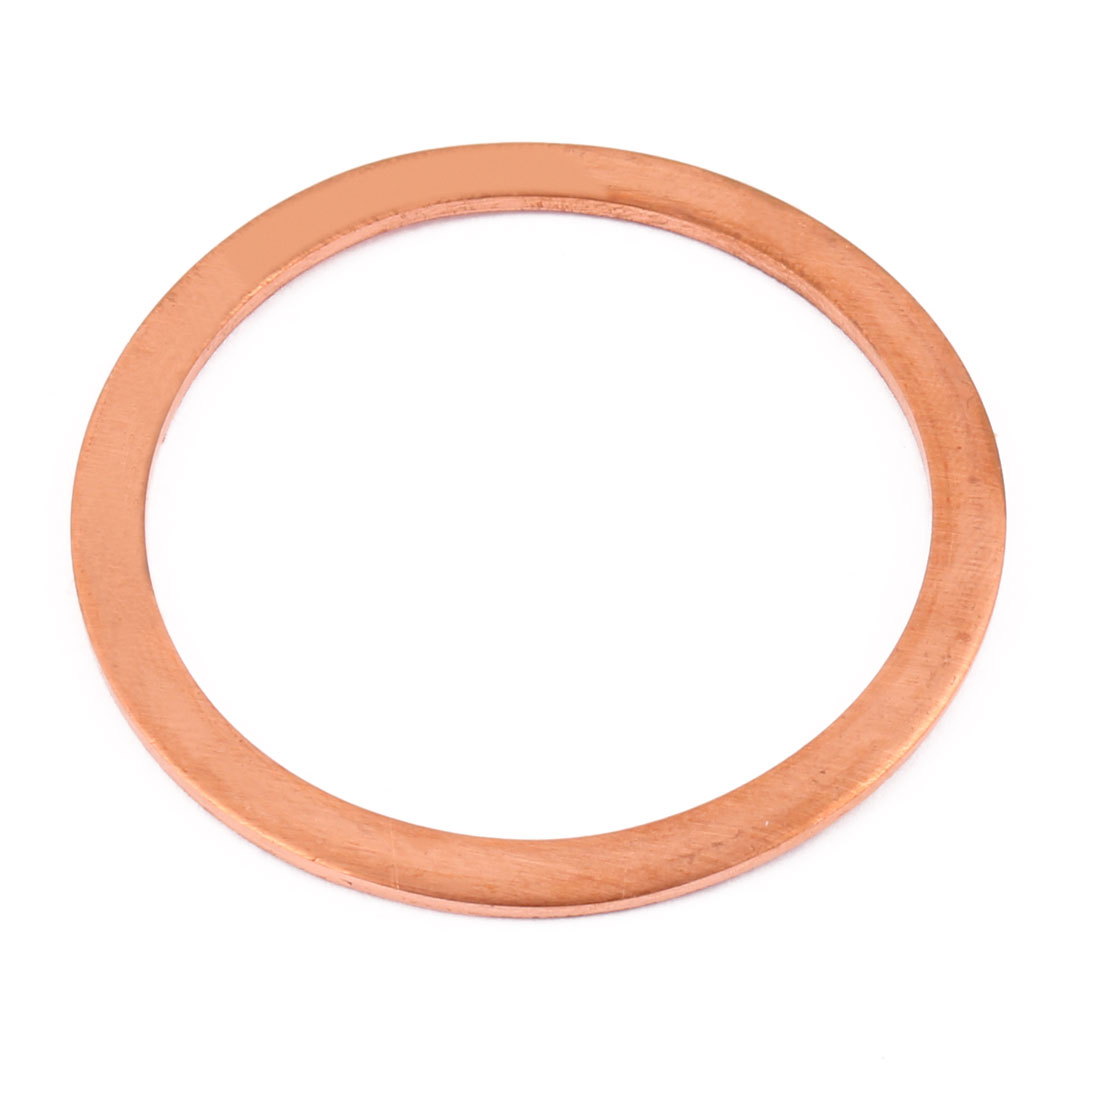 60mm x 50mm x 2mm Flat Ring Copper Crush Washer Sealing Gasket Fastener